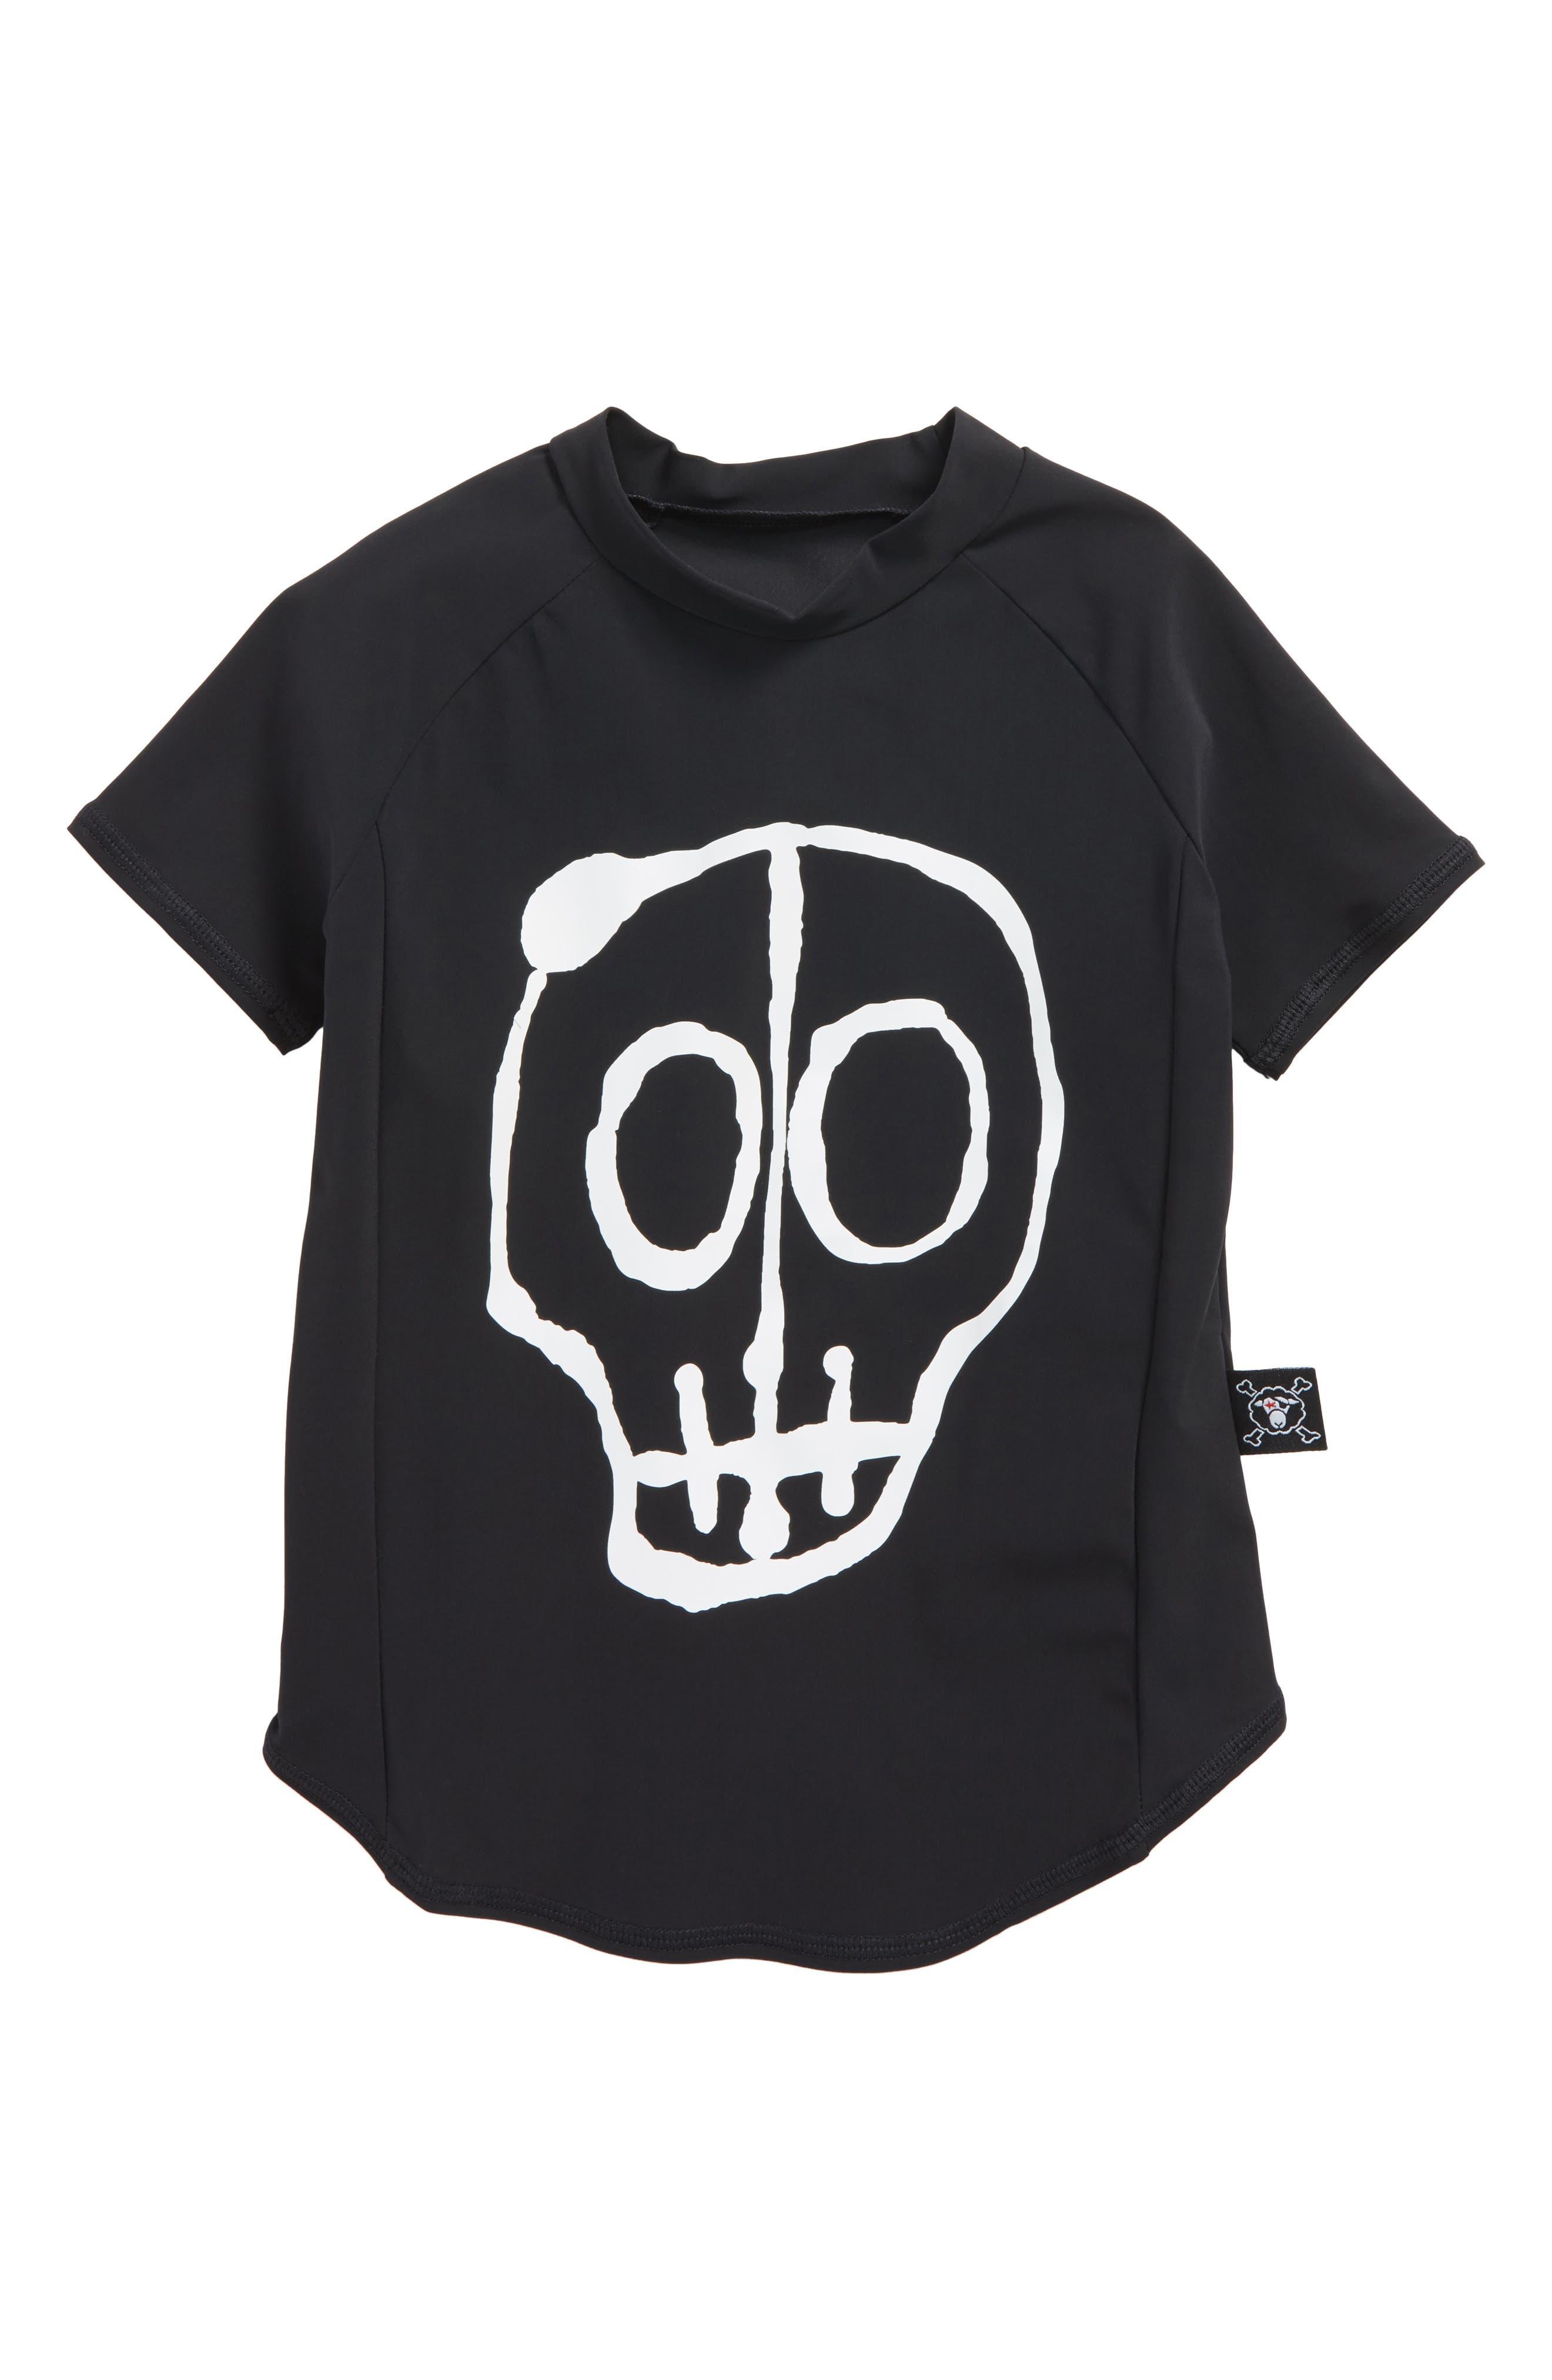 Skull Rashguard,                         Main,                         color, 001